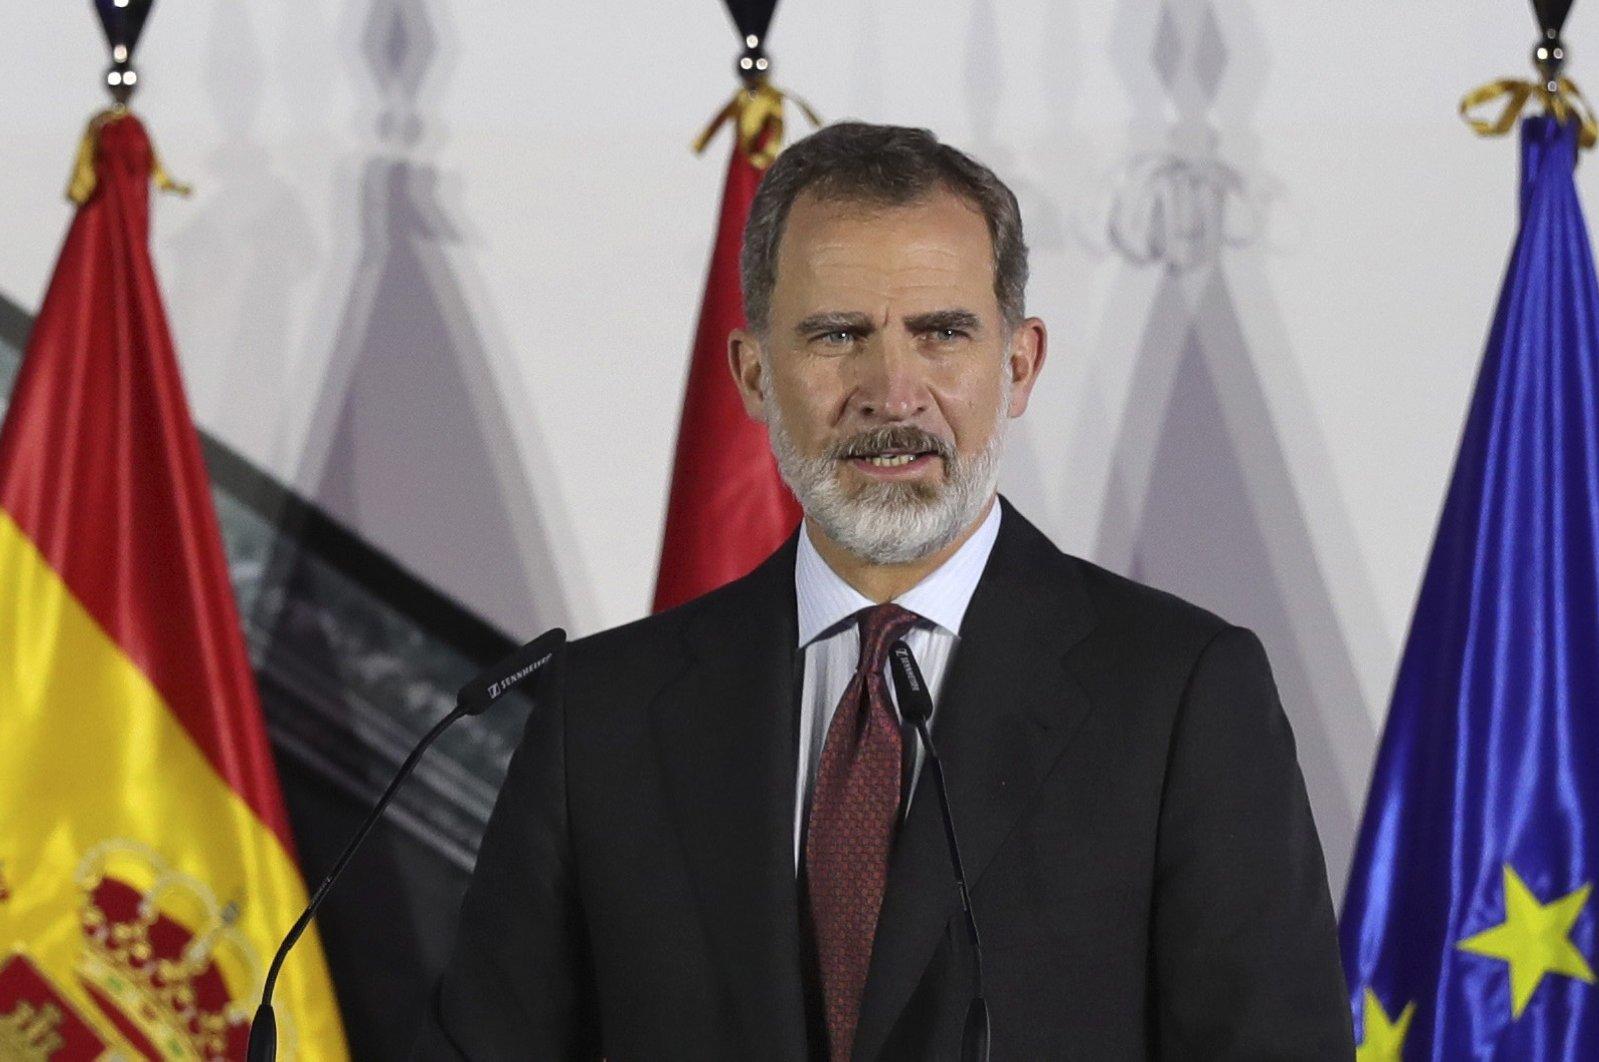 Spain's King Felipe VI delivers a speech at Cibeles Palace in Madrid, Spain, Nov. 19, 2020. (EPA Photo)